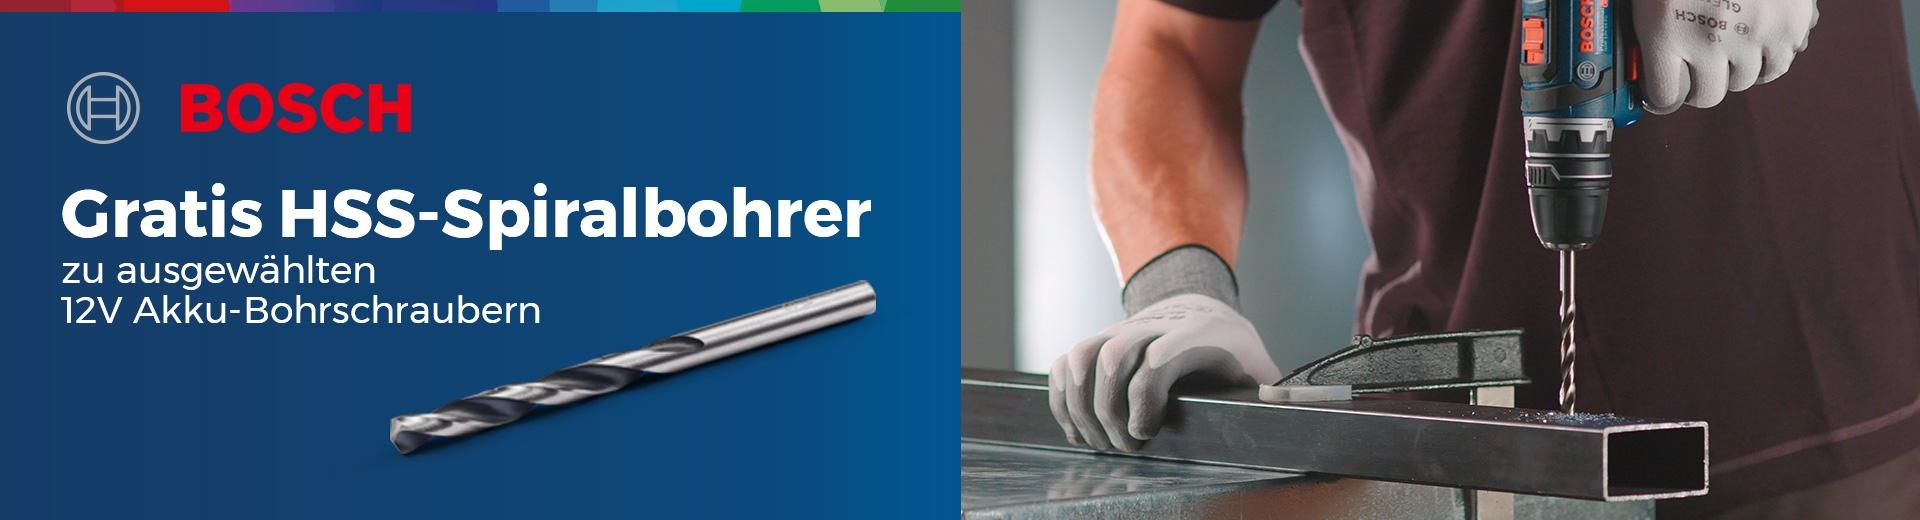 Bosch - Gratis Metallbohrer